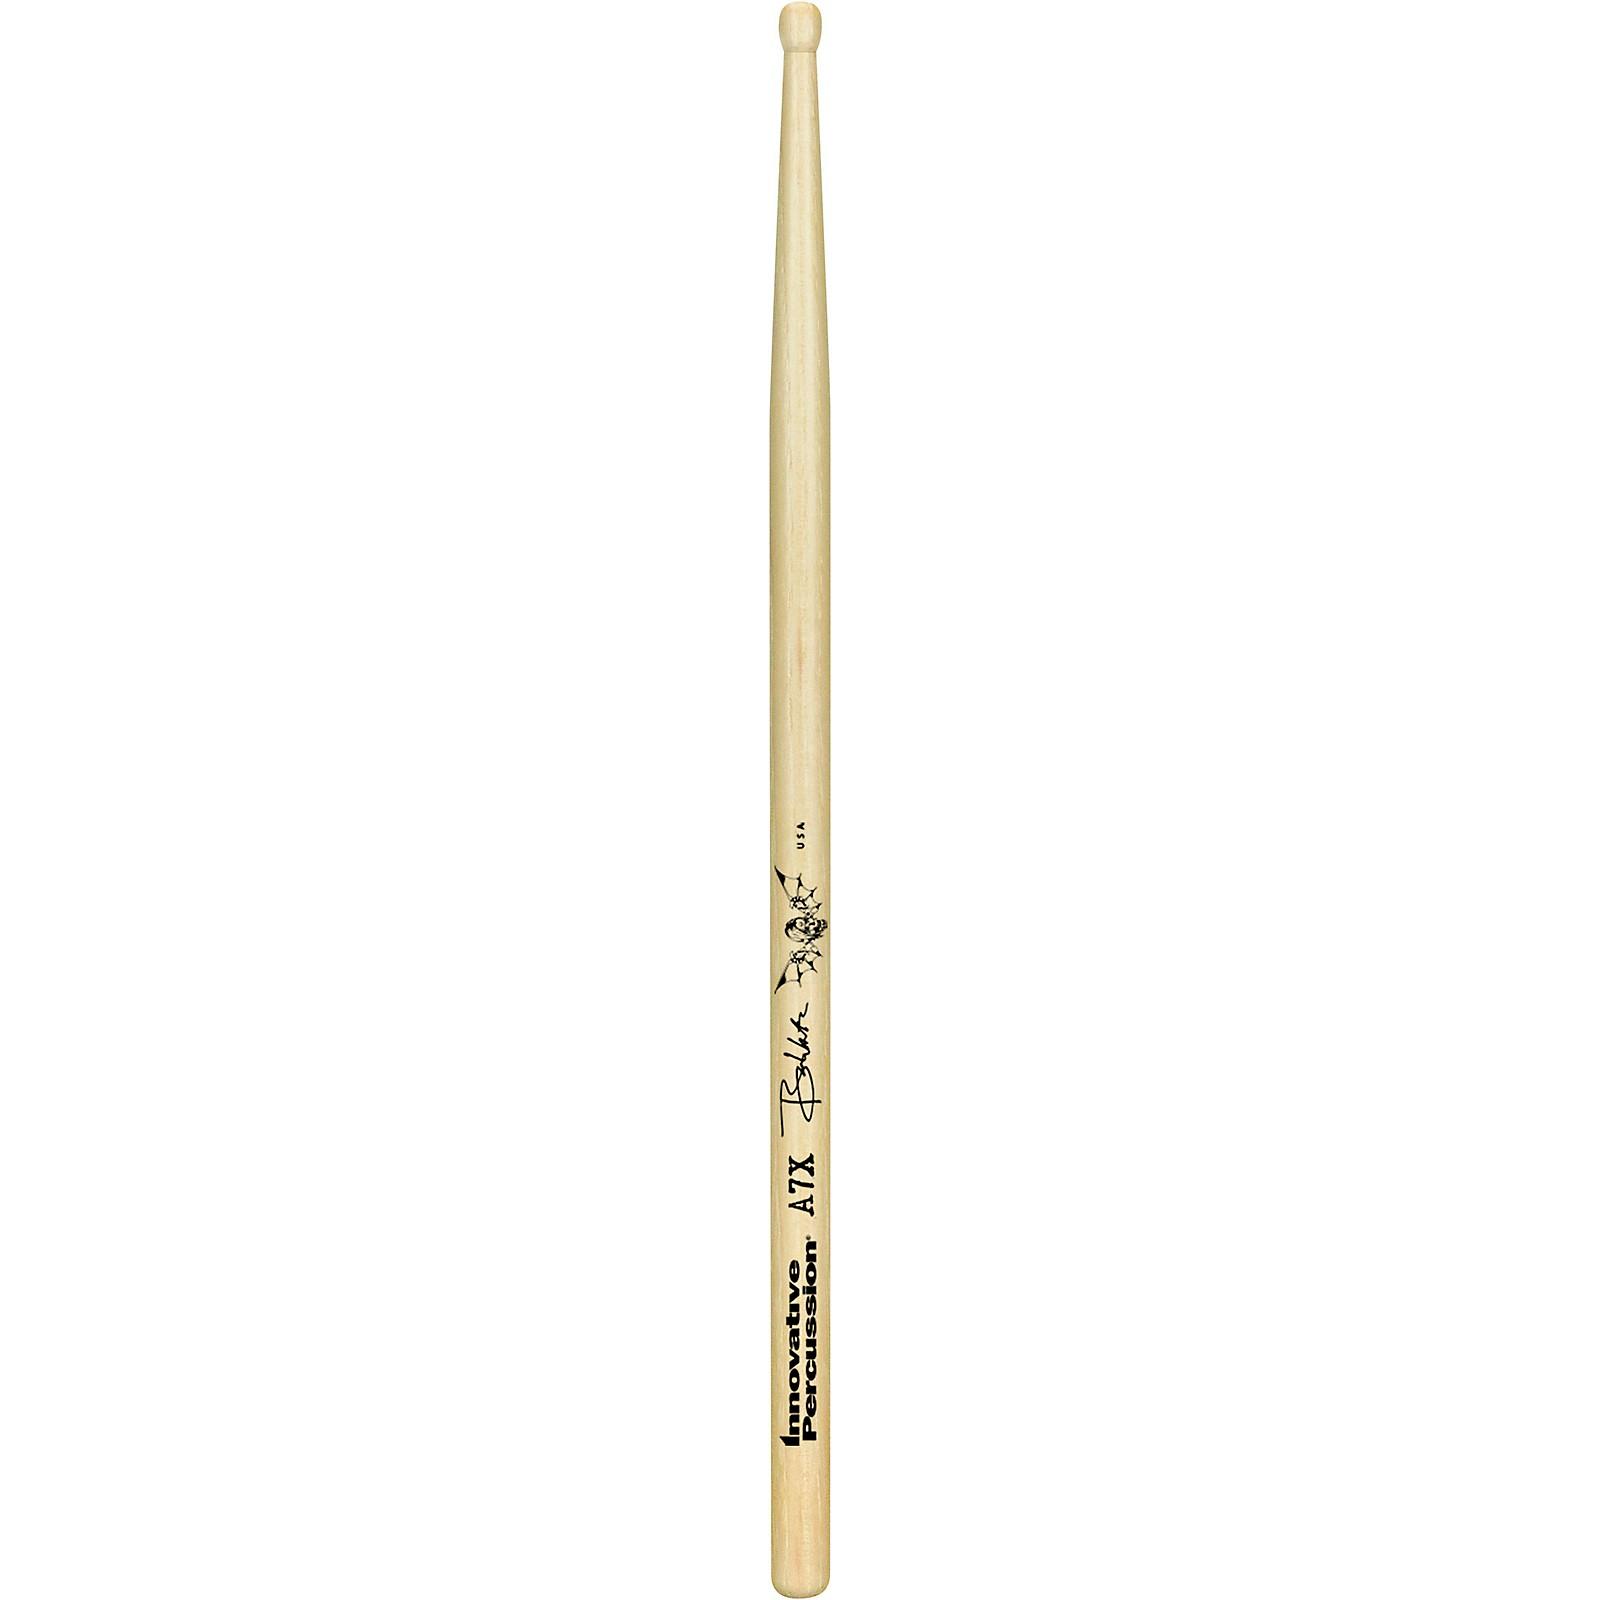 Innovative Percussion A7X Brooks Wackerman Signature Drum Stick